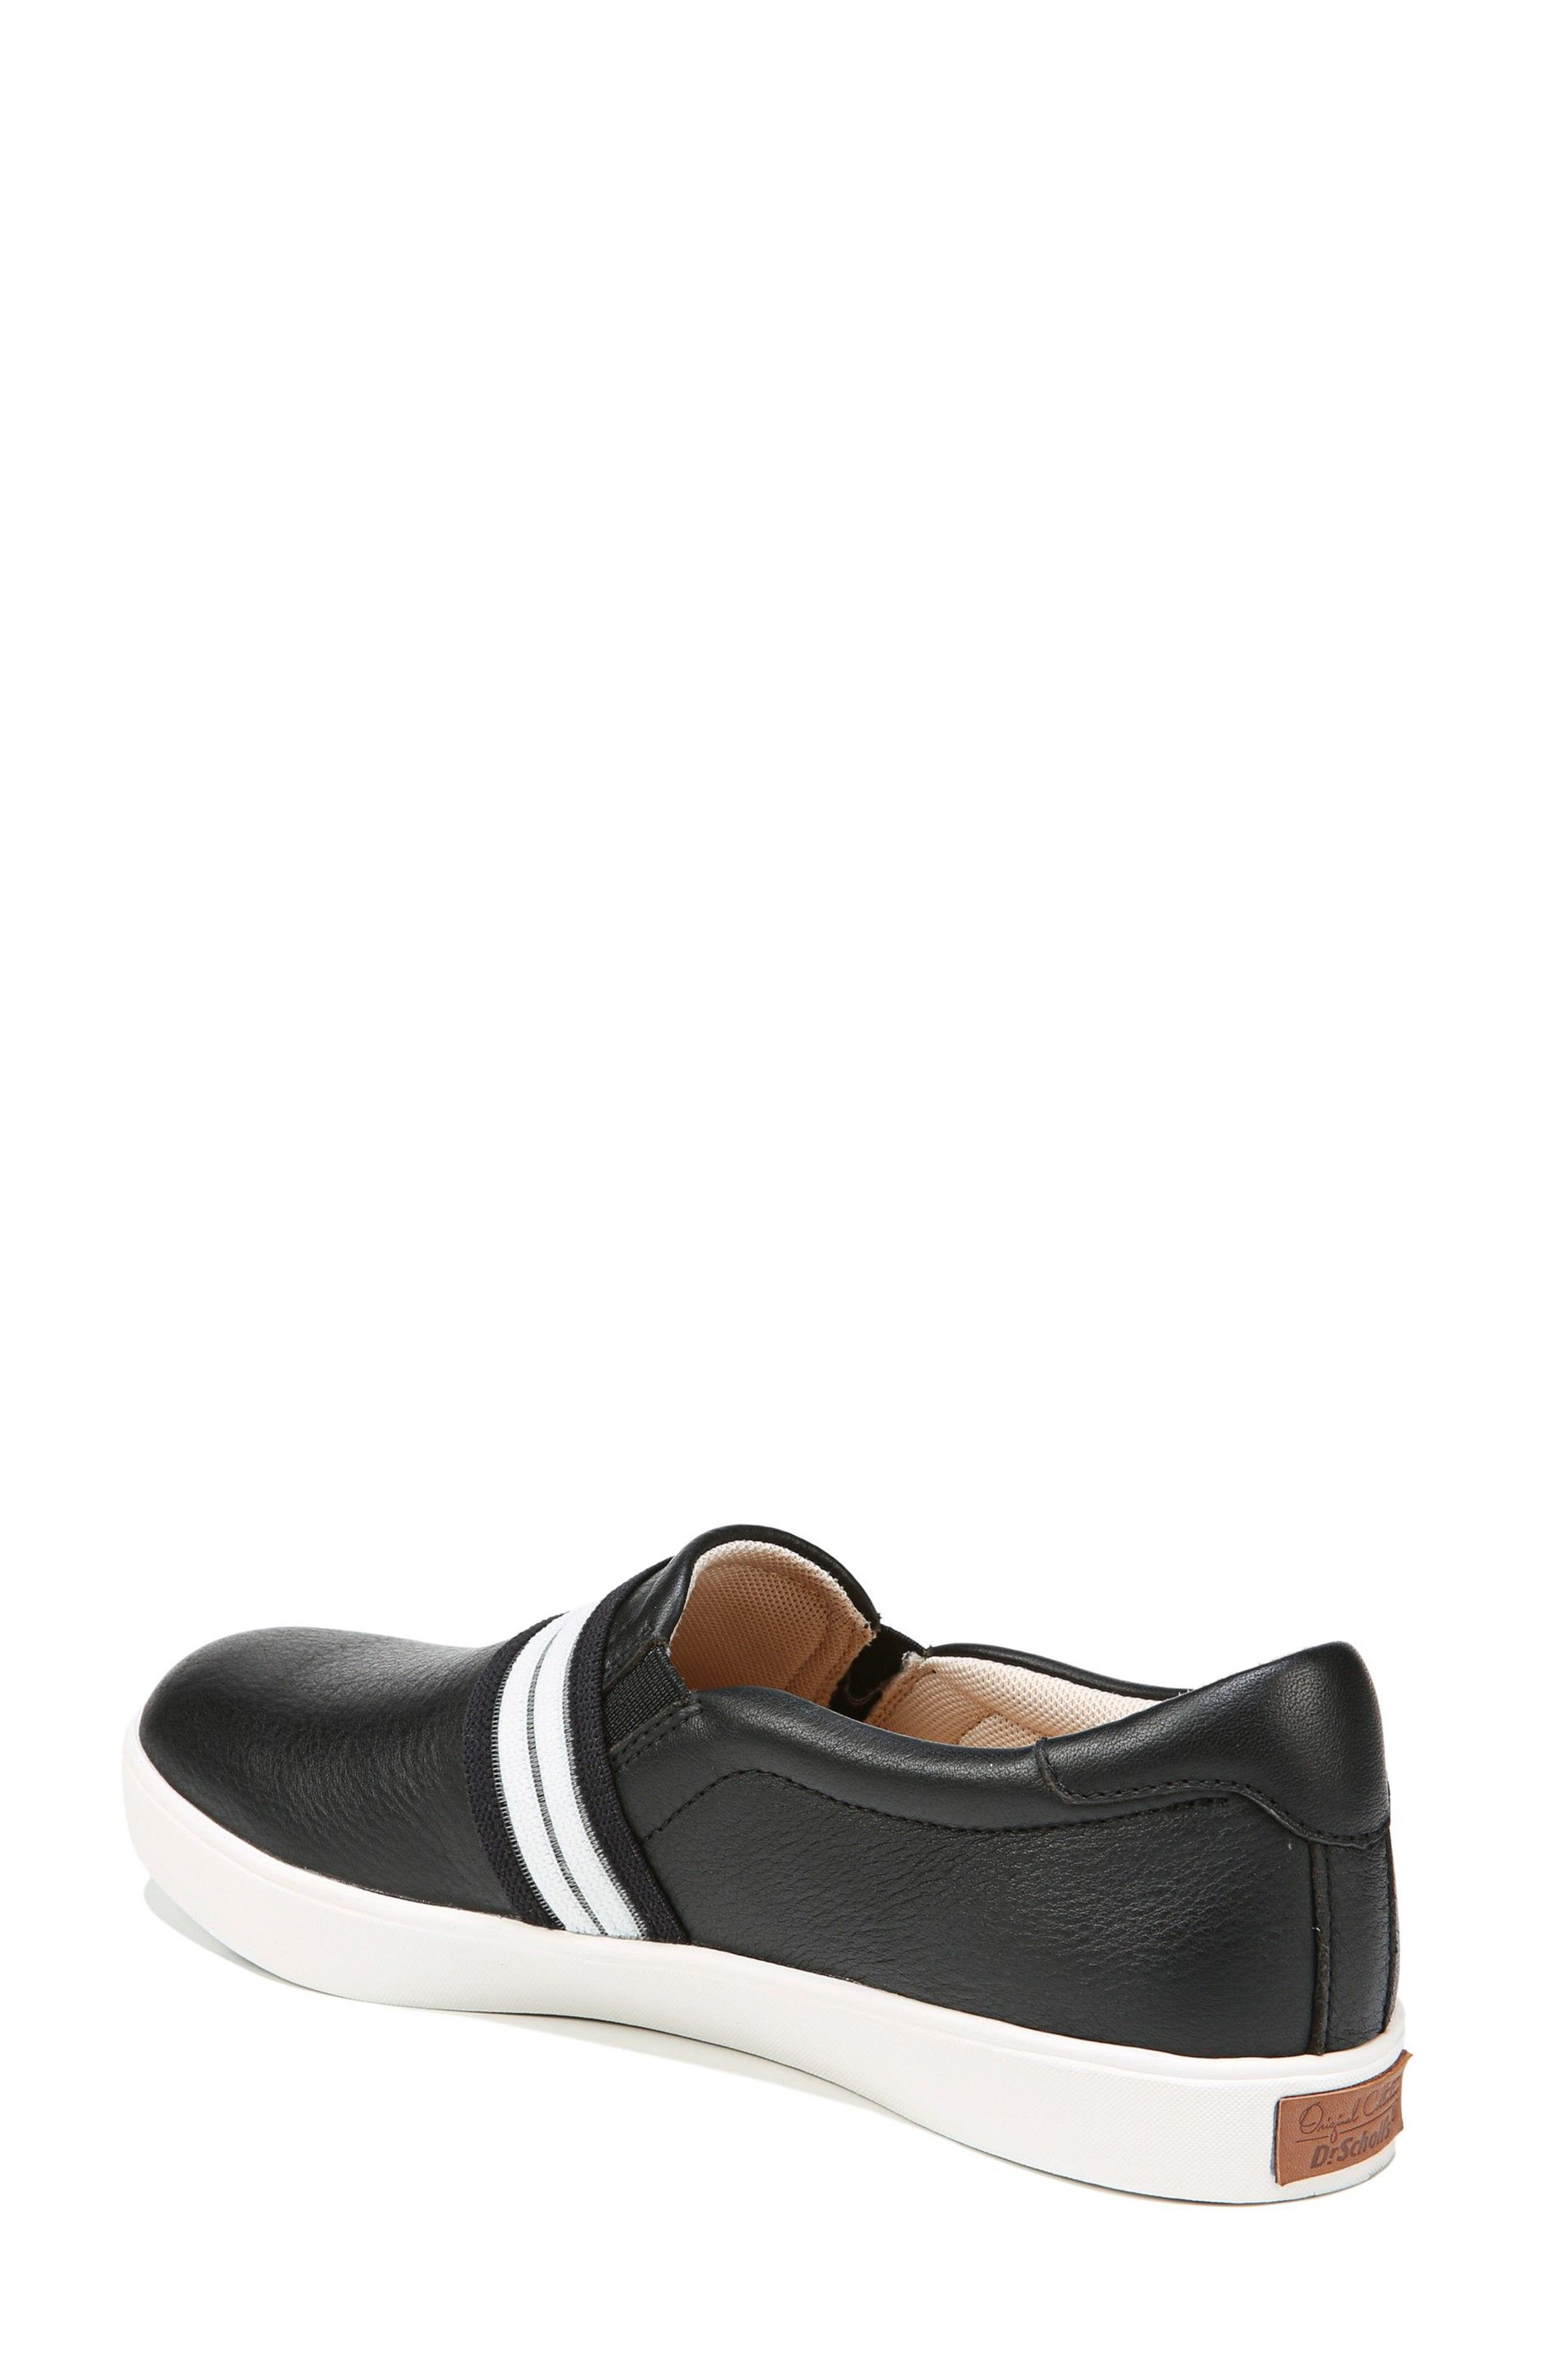 DR. SCHOLL'S, Scout Slip-On Sneaker, Alternate thumbnail 2, color, BLACK LEATHER 2